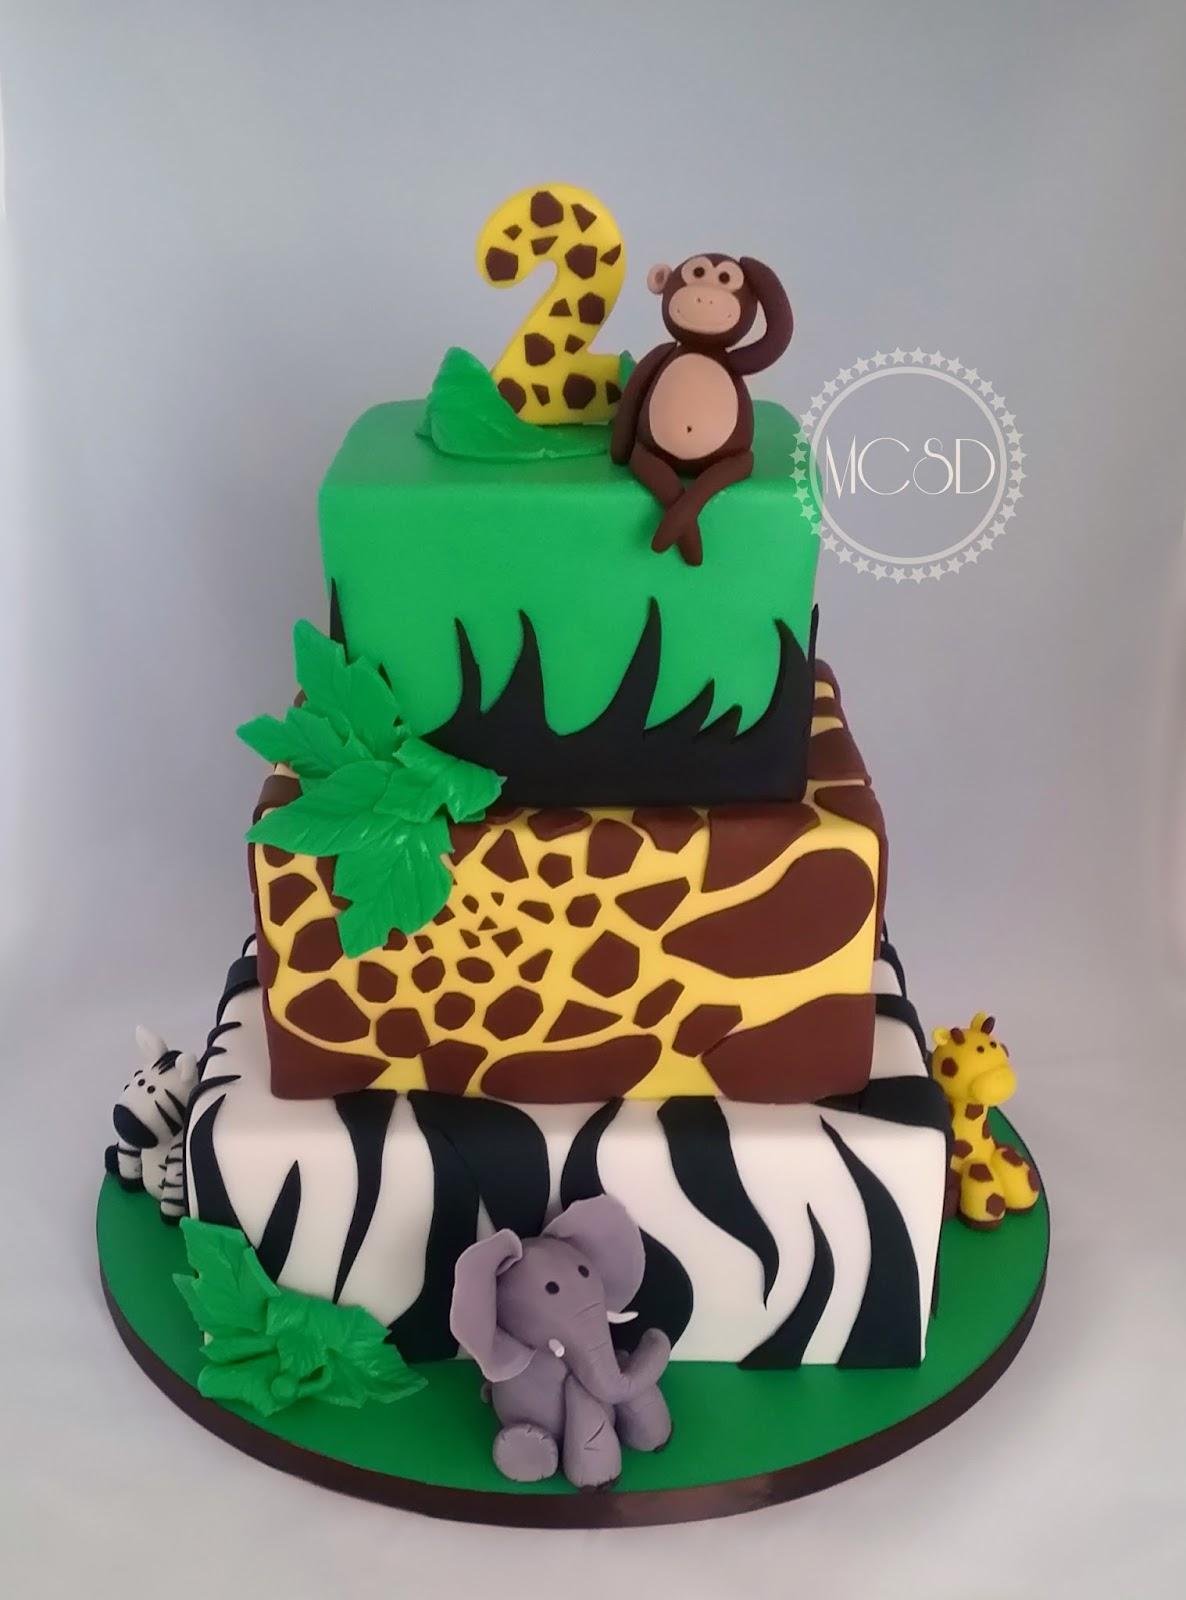 Groovy Cakesbyzana Safari Jungle Birthday Cake Personalised Birthday Cards Bromeletsinfo